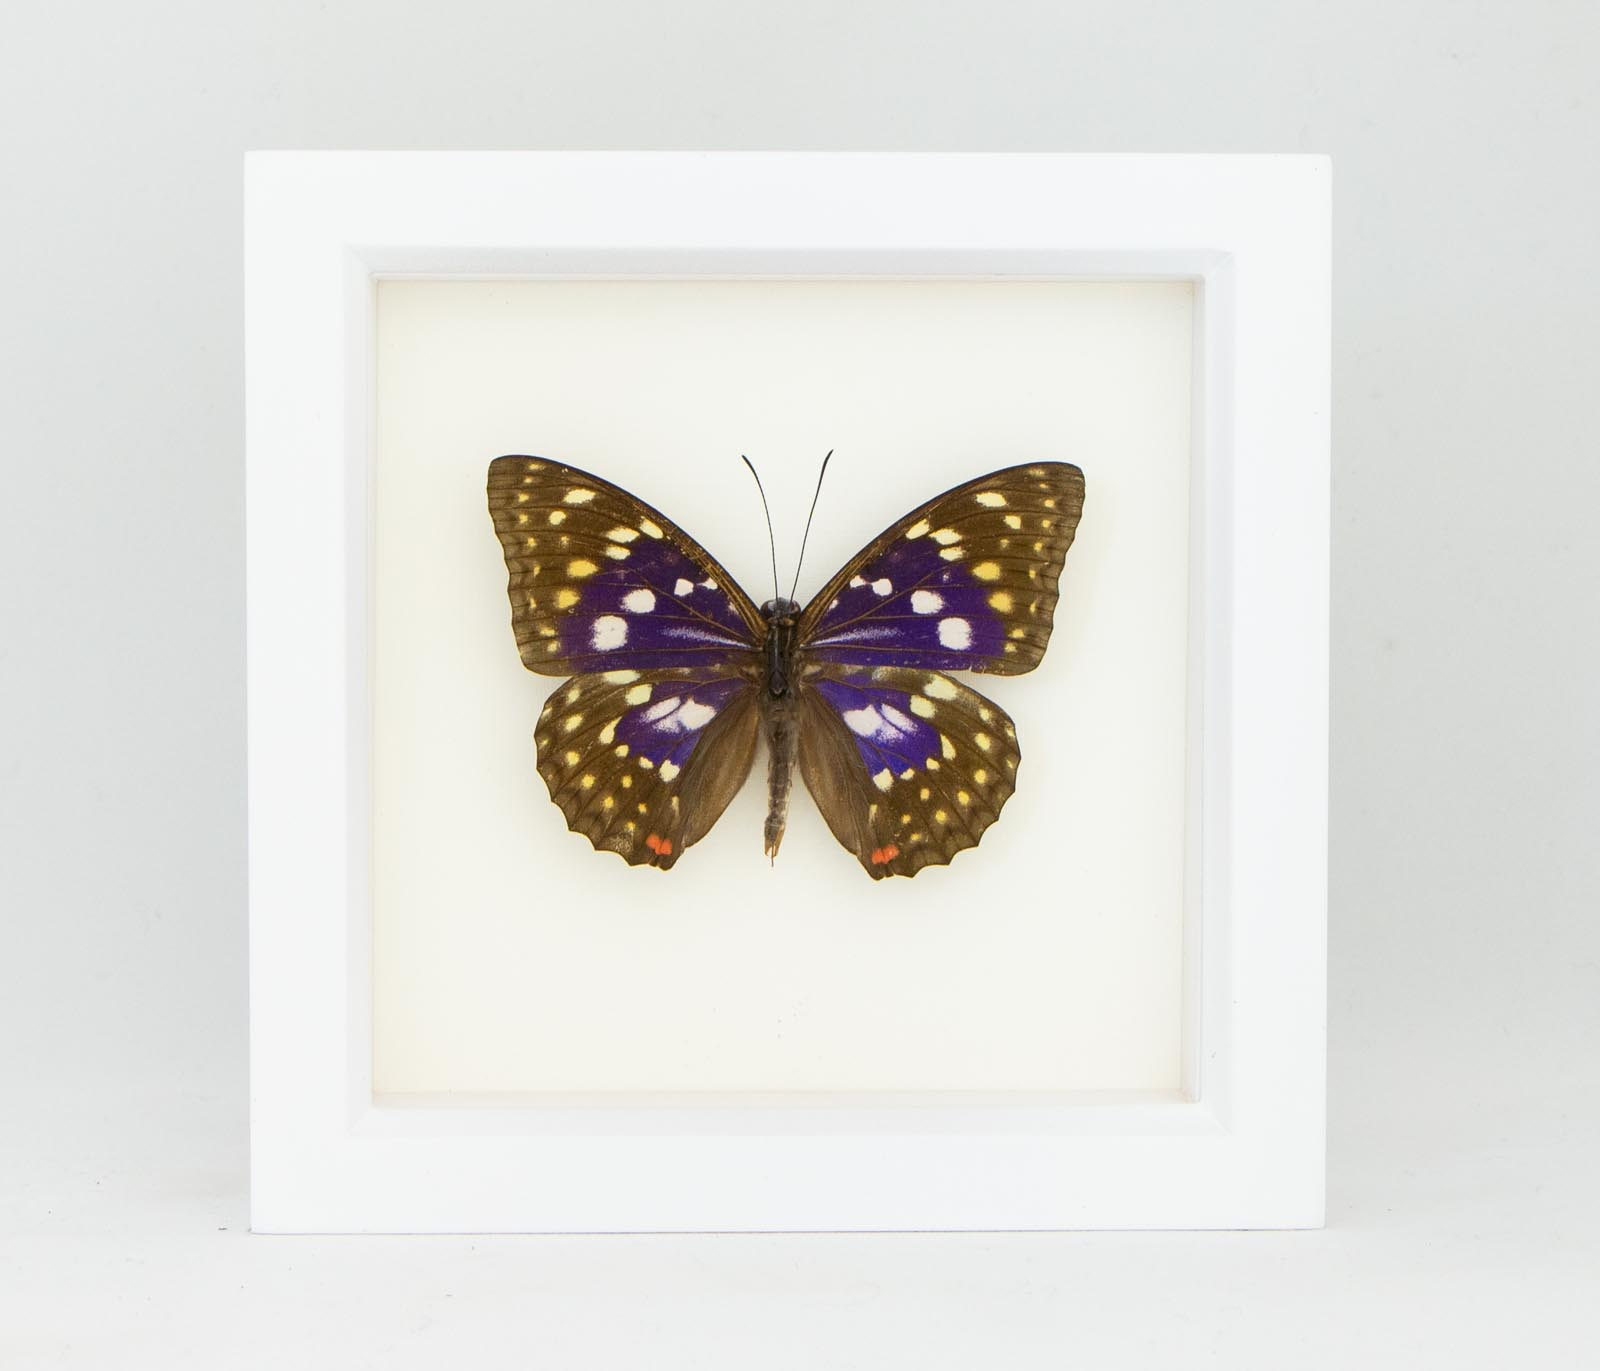 Lot of 10 Great Purple Emperor Butterfly Sasakia charonda coreana Folded FAST US